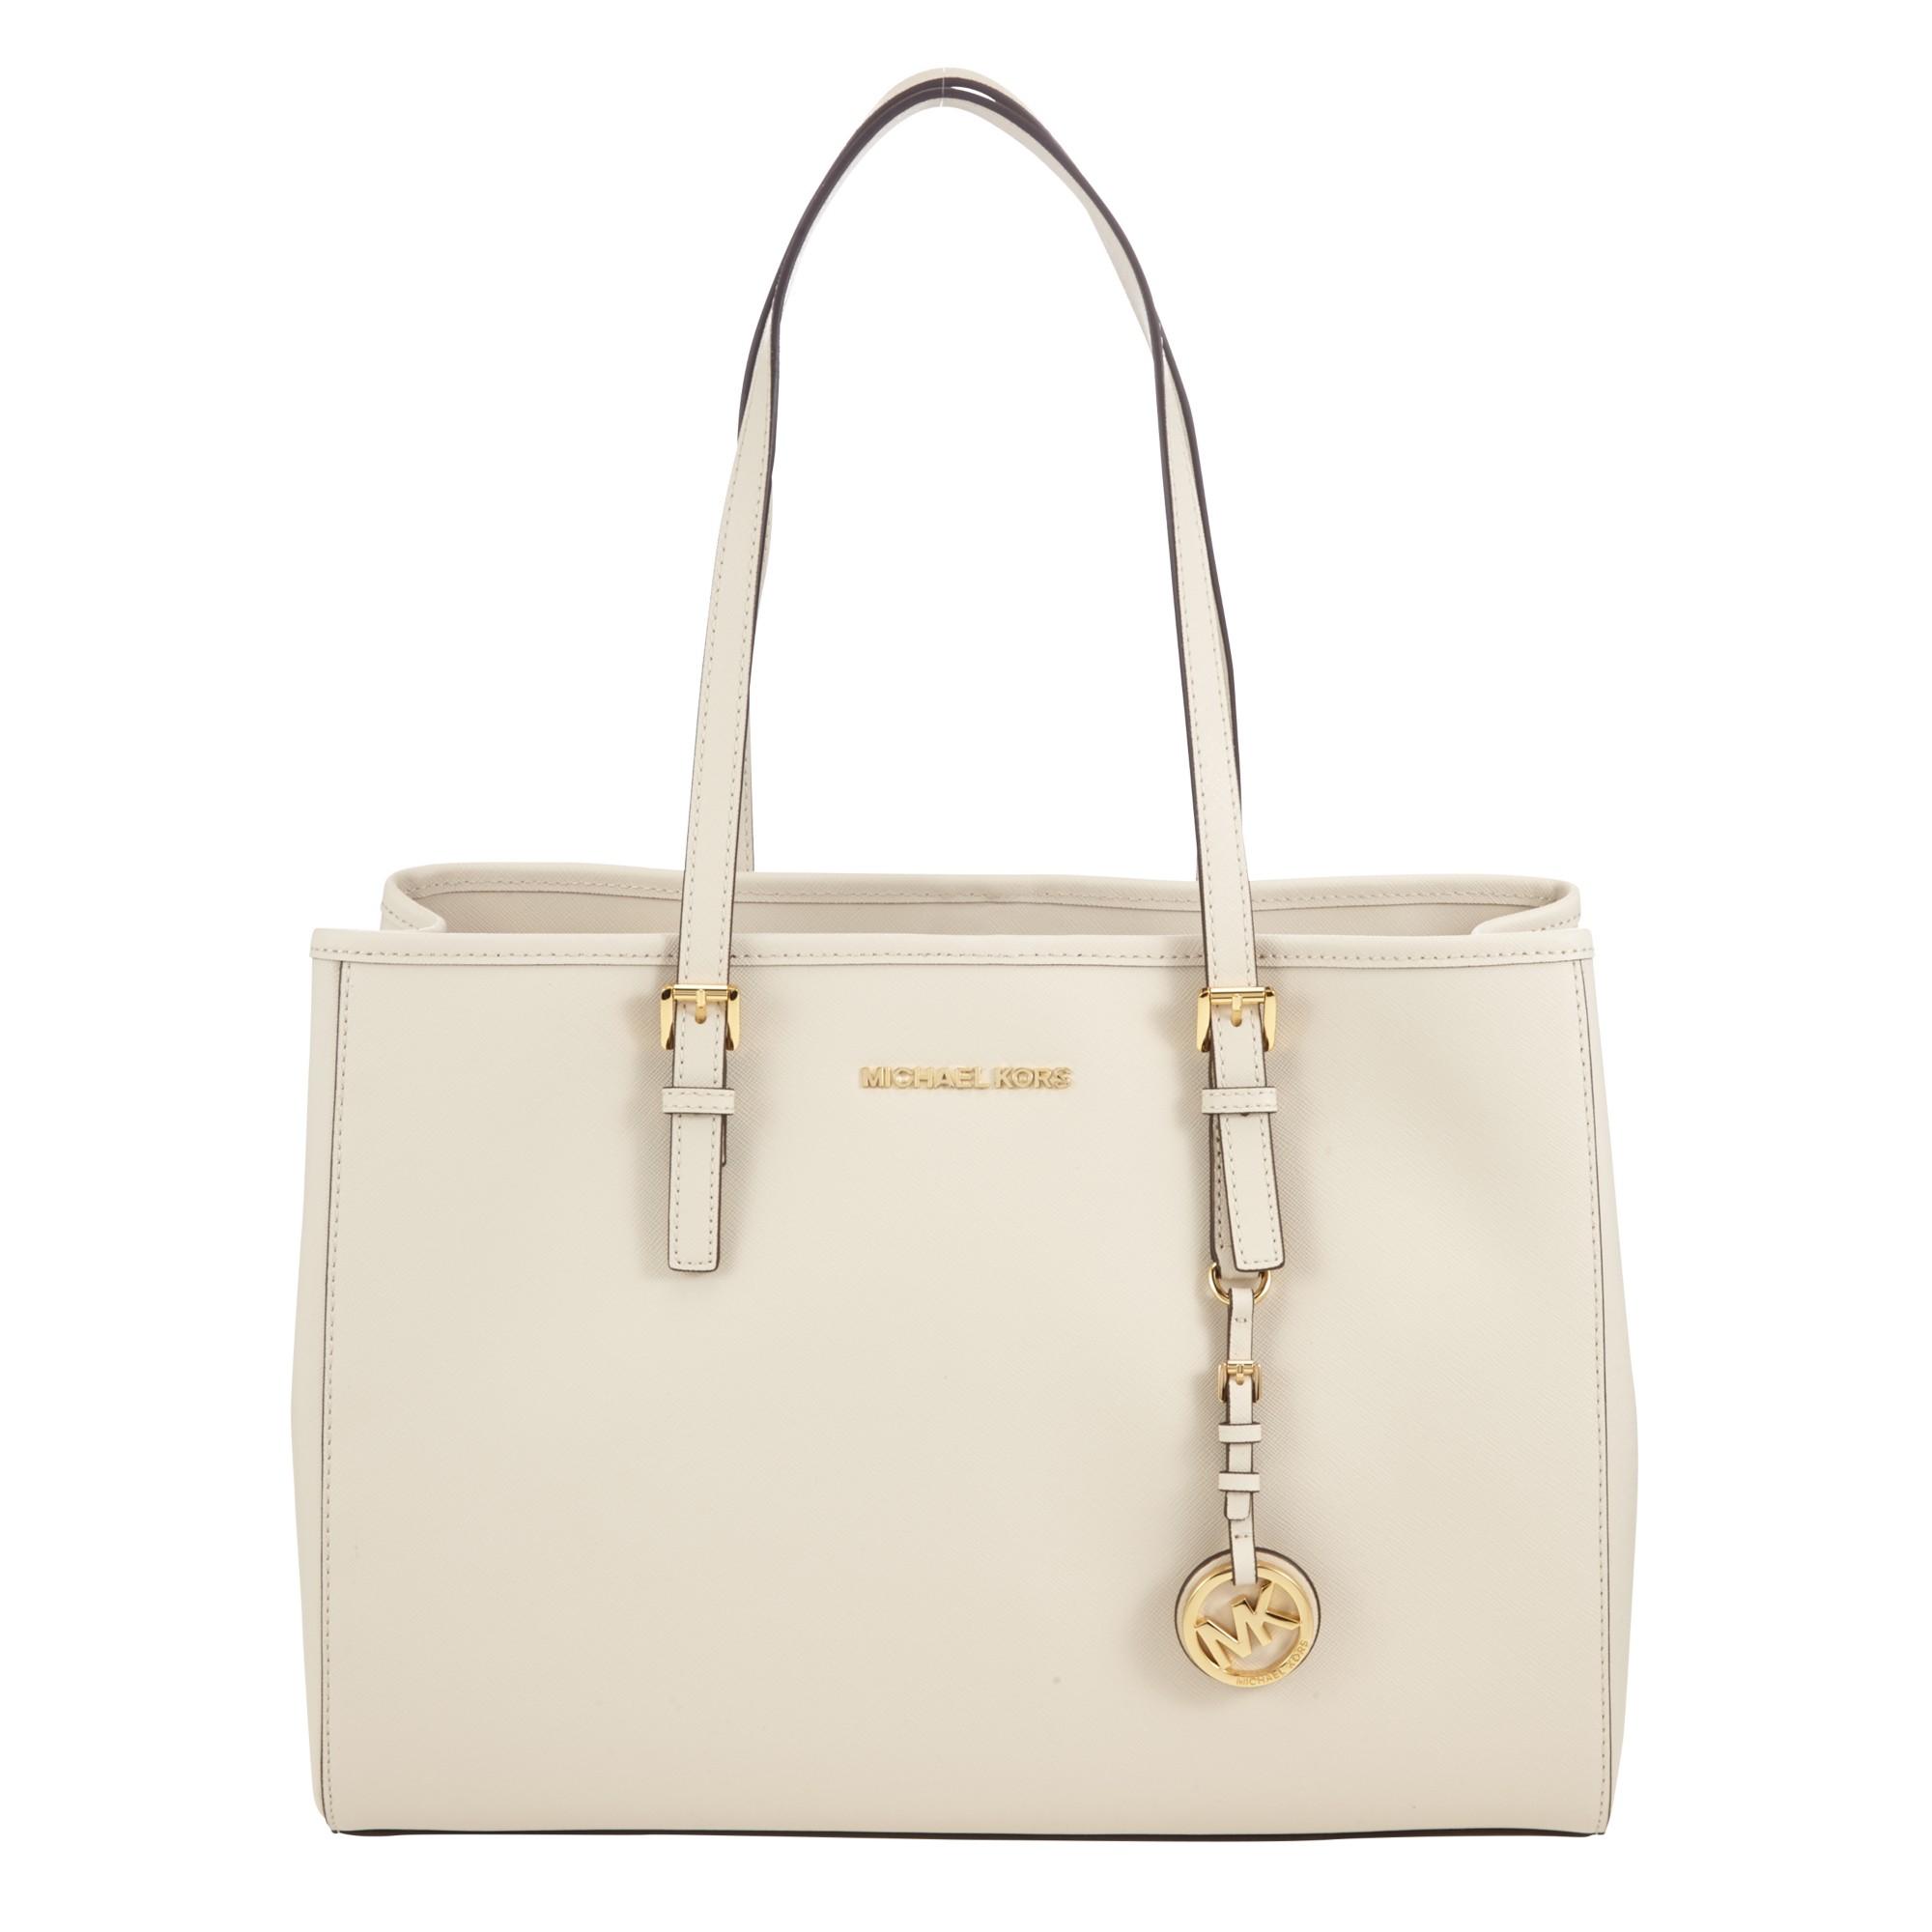 Cream Michael Kors Handbag Jet Set Eastwest Large Leather Tote Bag